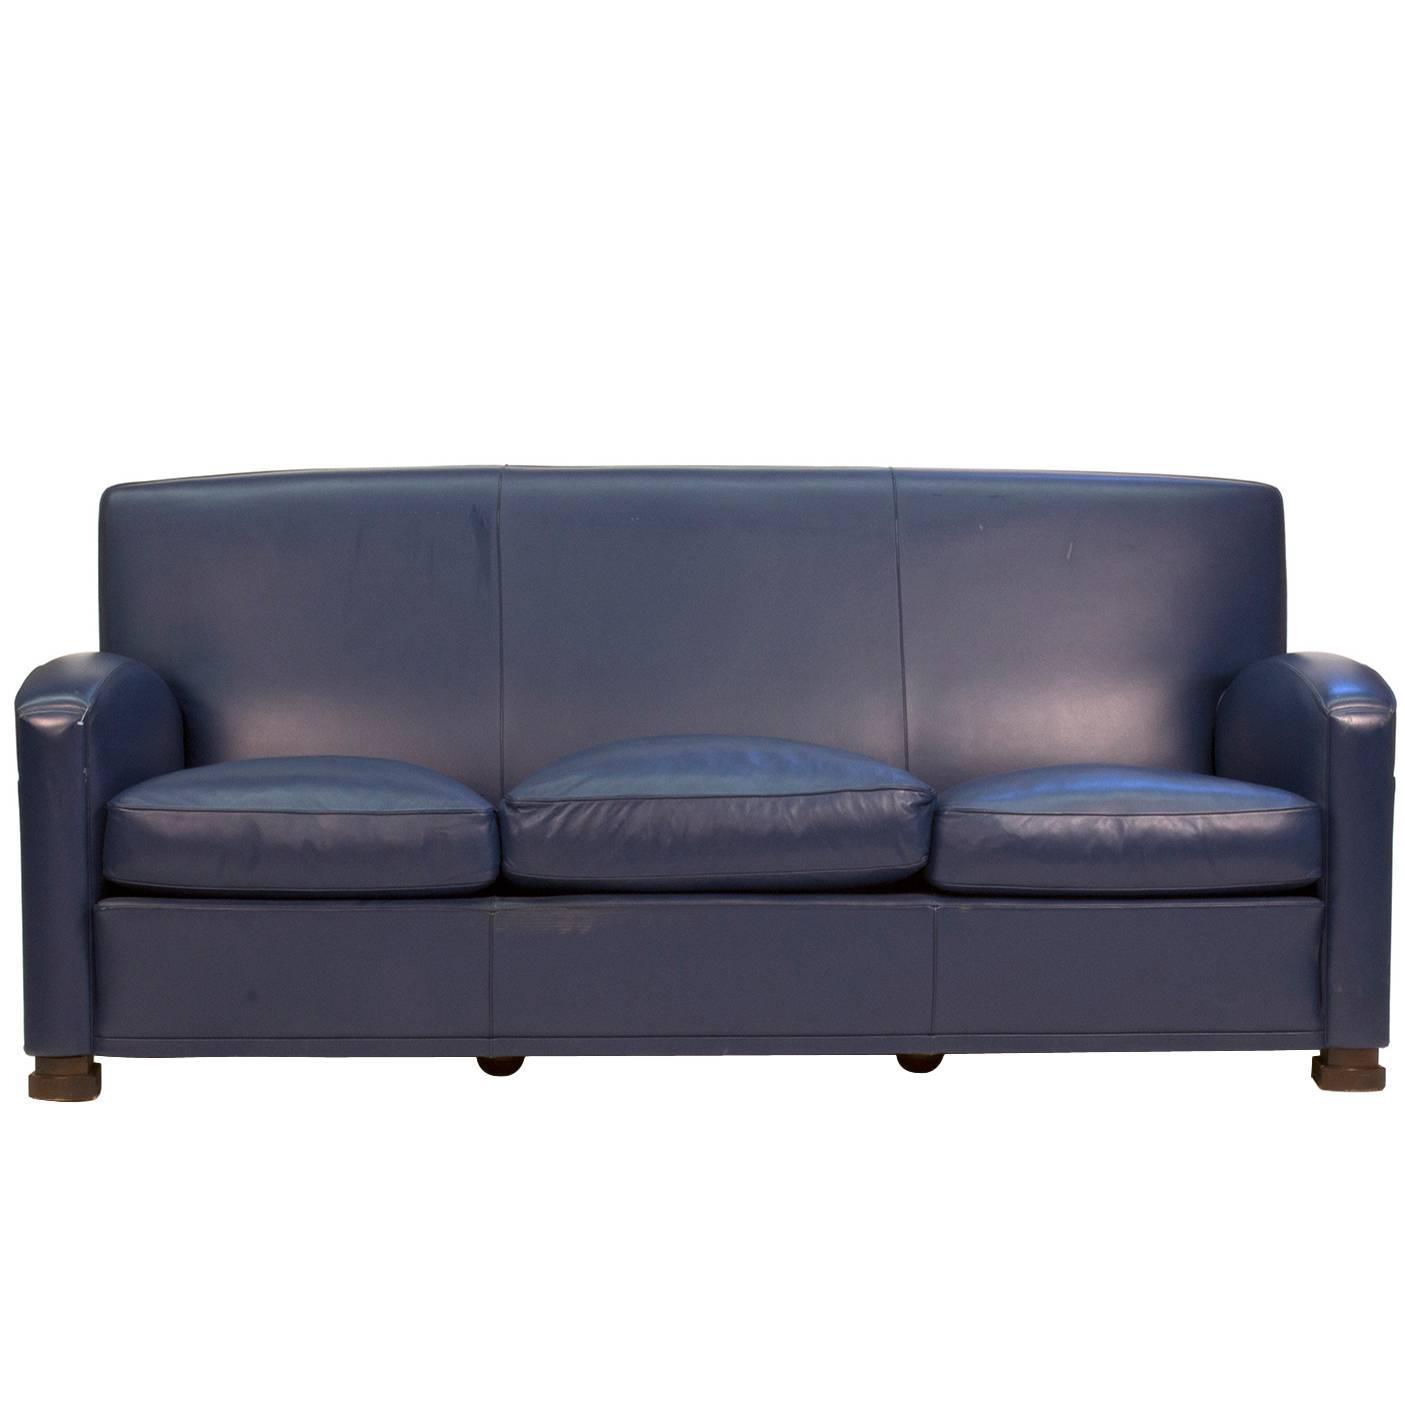 Tabarin Three Seat Sofa by Renzo Frau for Poltrona Frau Italy For